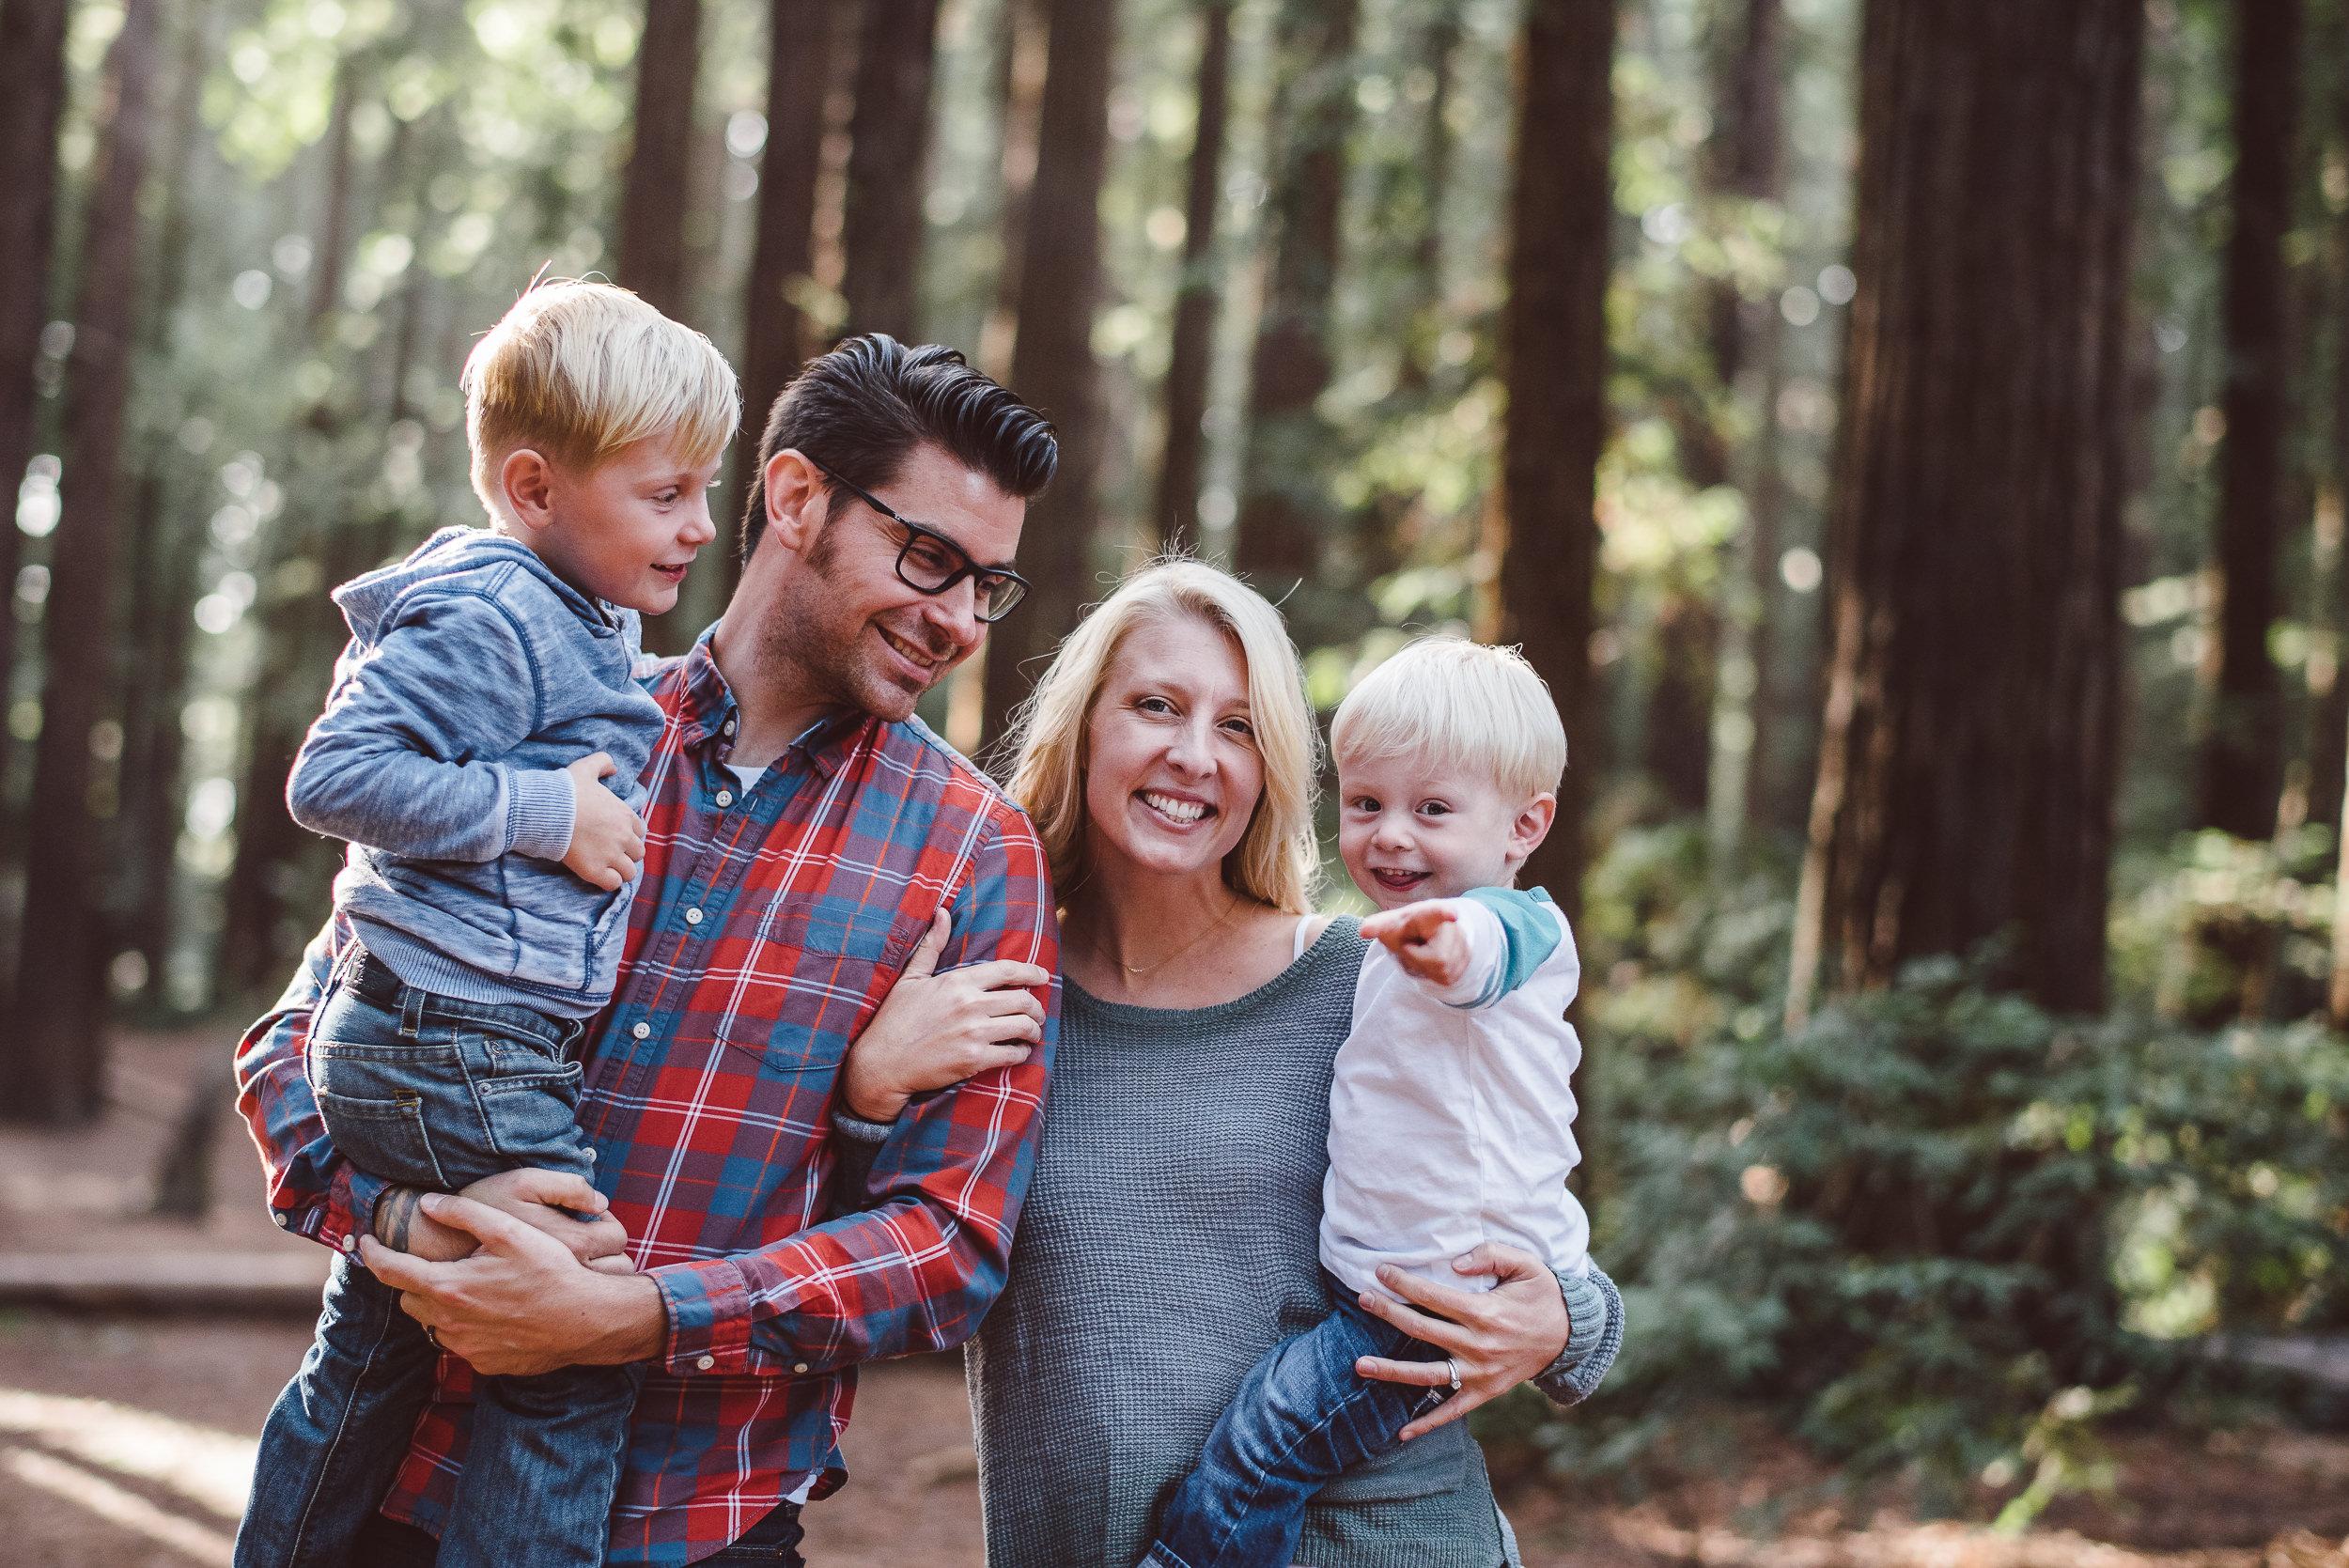 Joaquin-Miller-Park-Oakland-Family-Photography-002.jpg